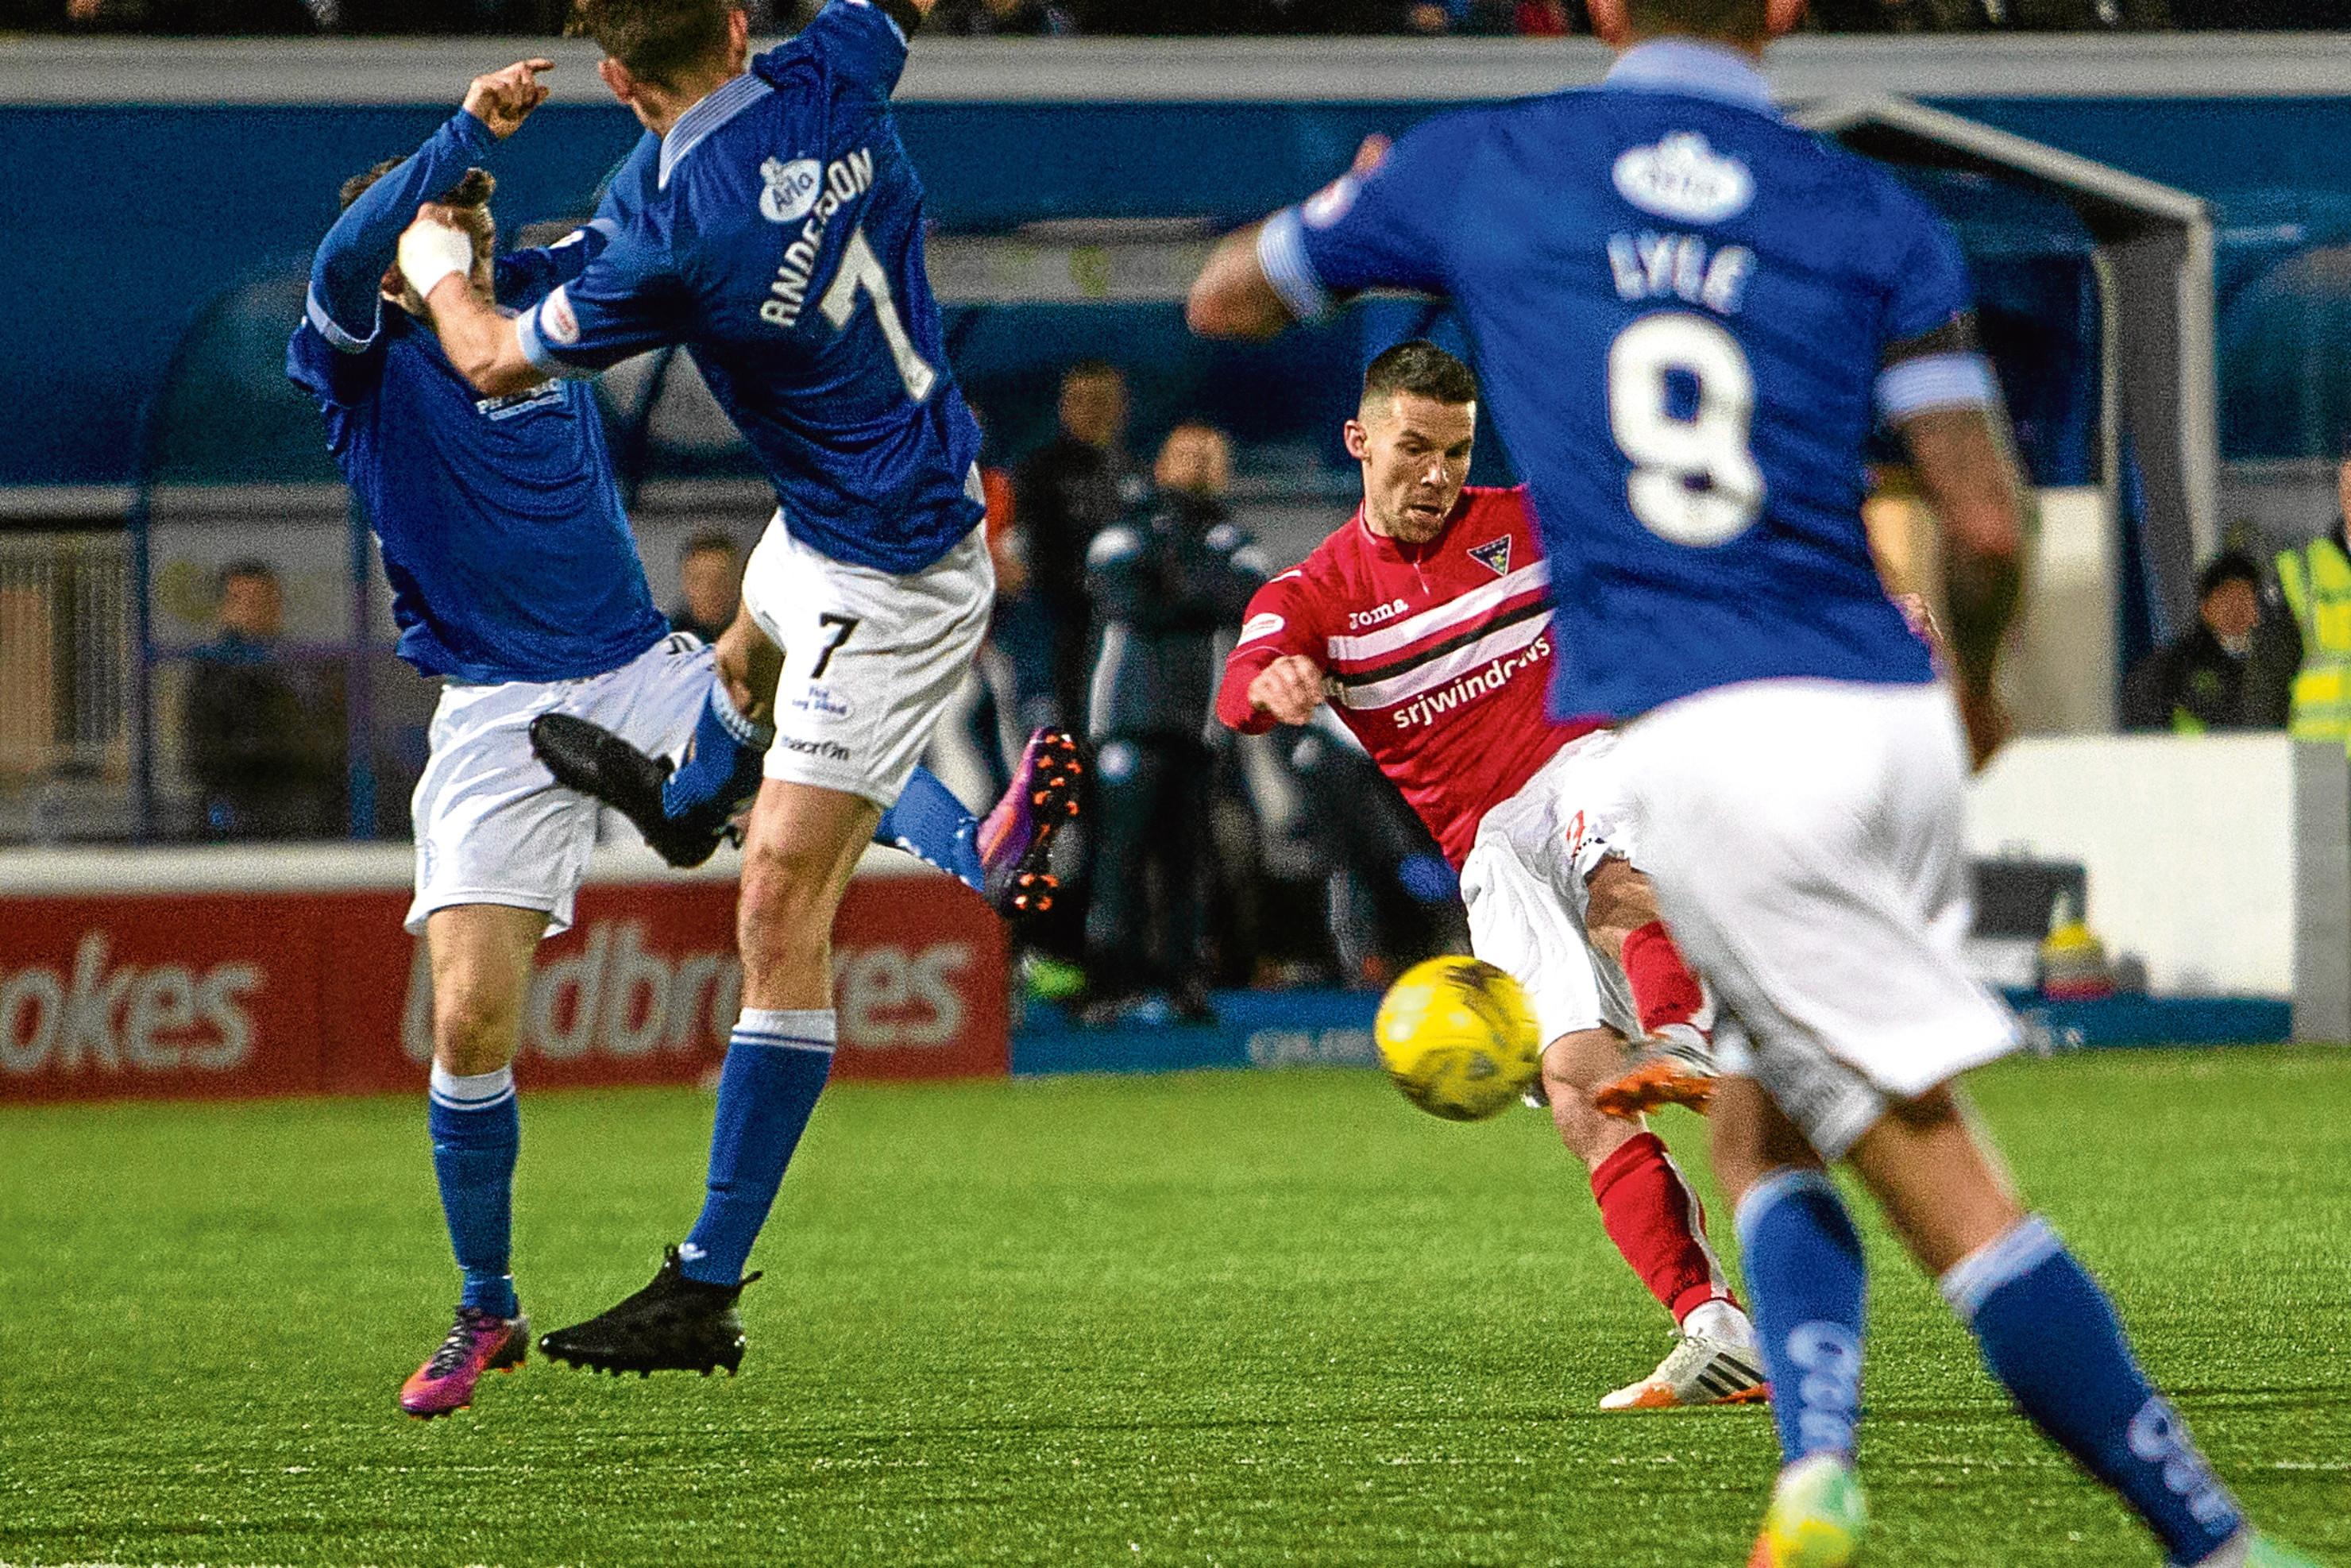 Justin Talbot scores for Dunfermline.